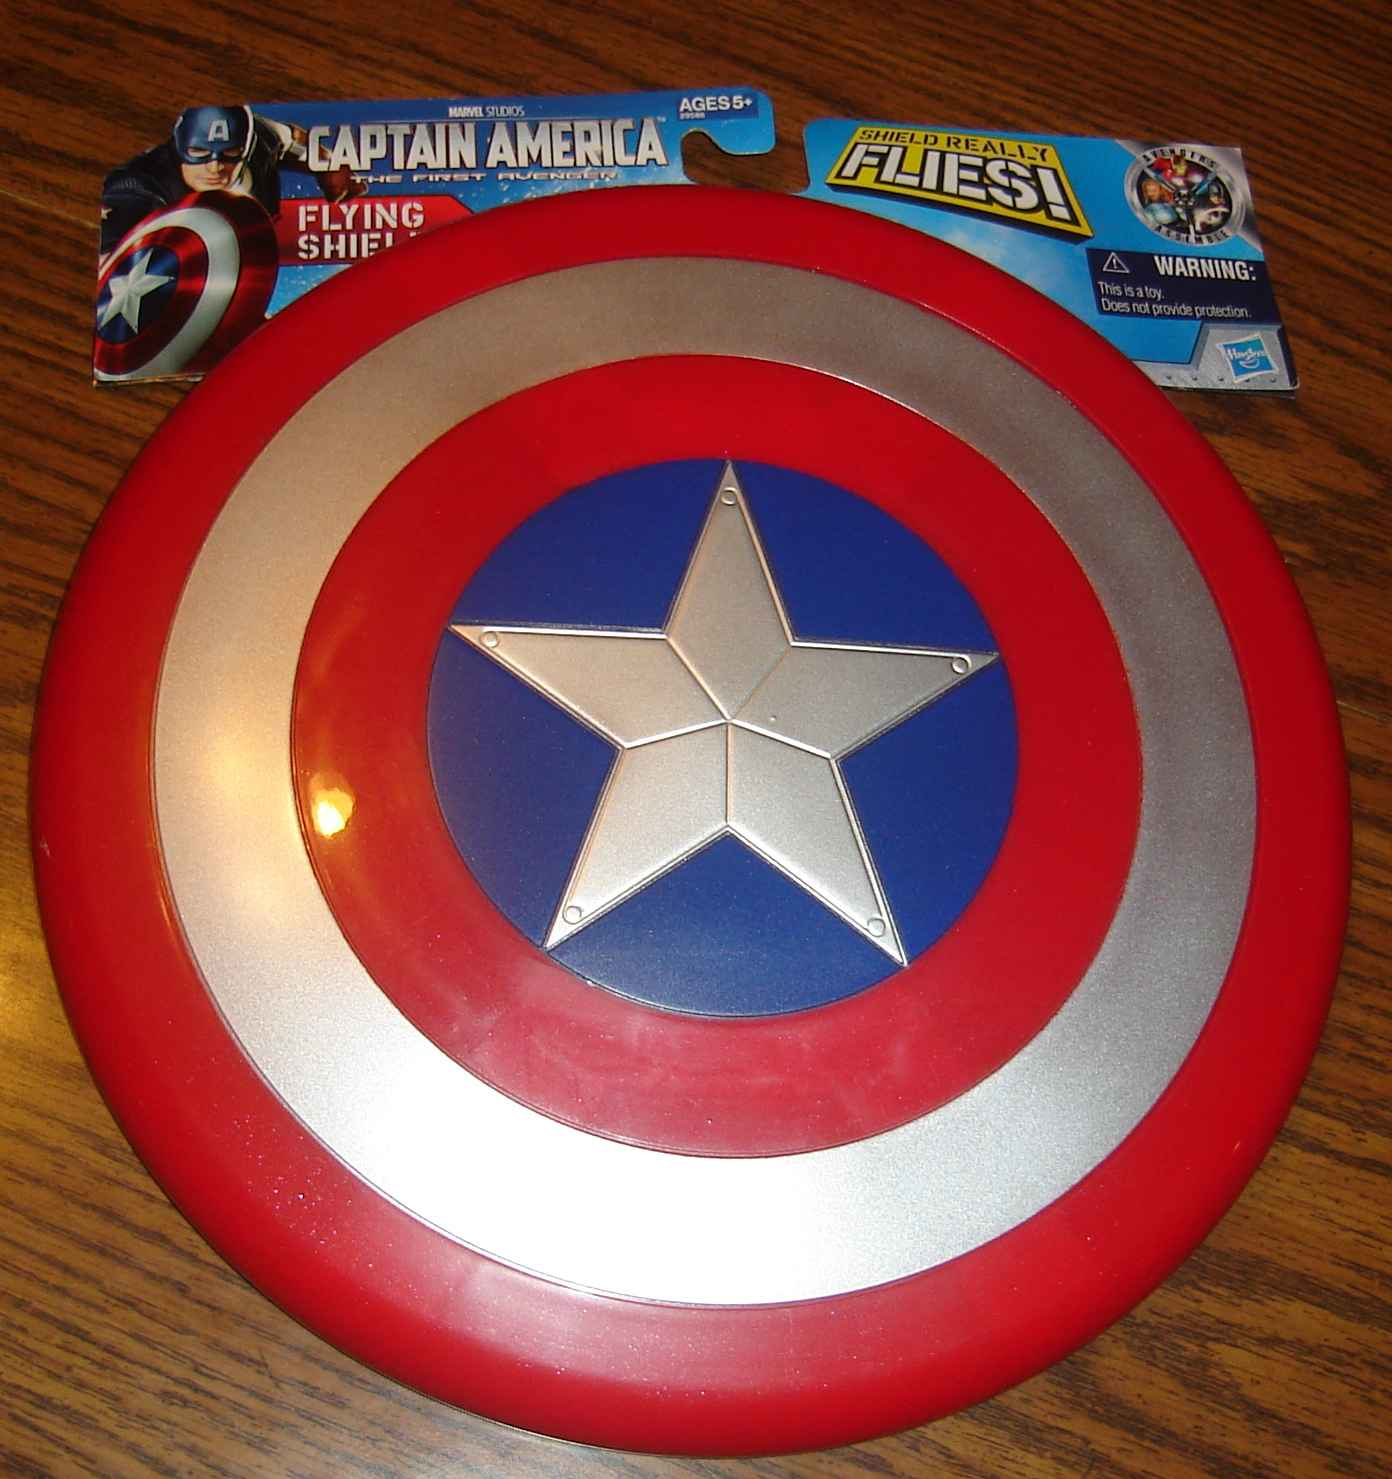 Captain America's Frisbee